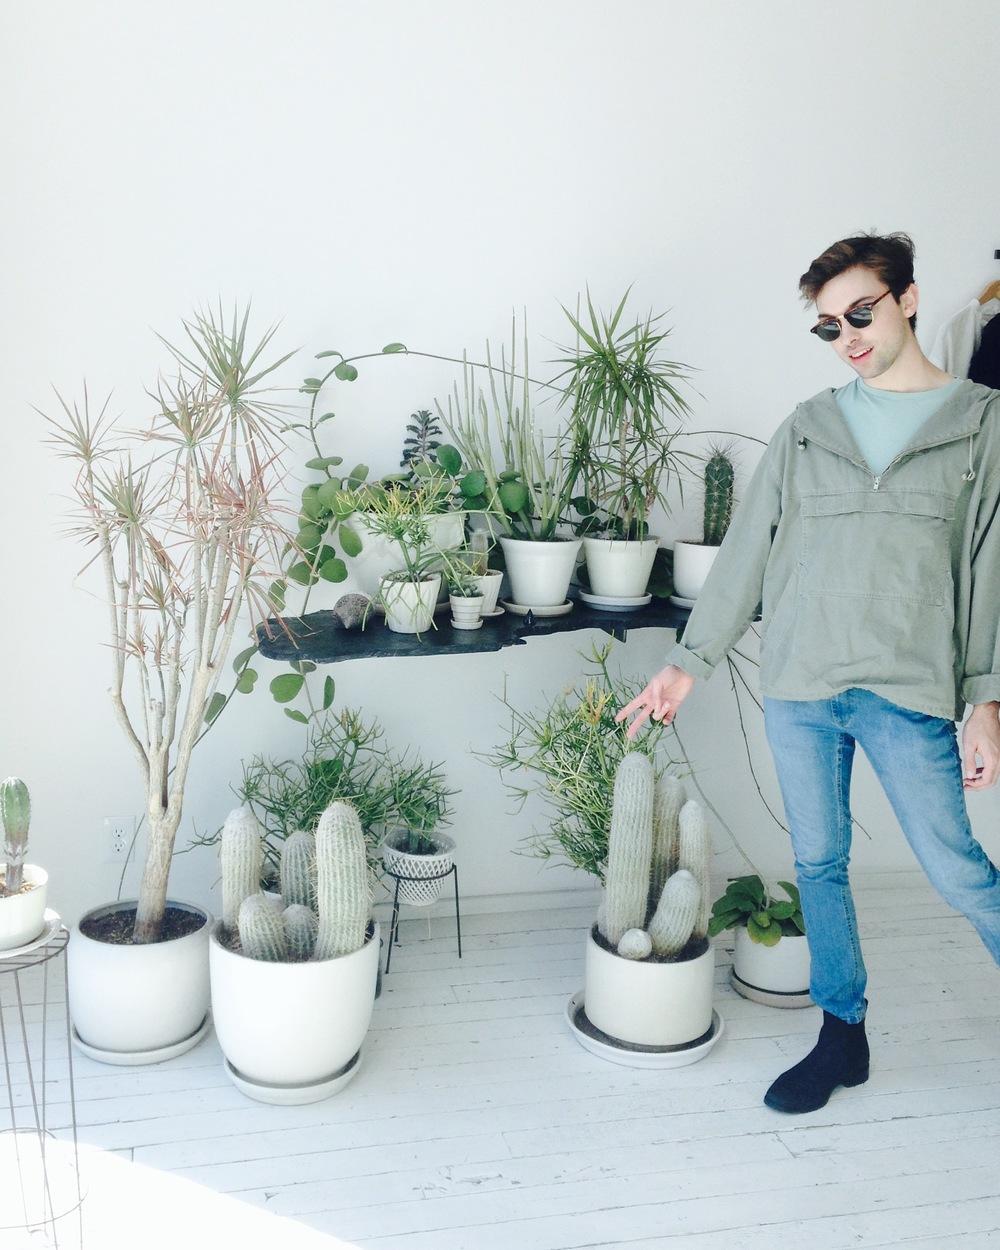 #shopping #melrose #cacti #CALIBABY